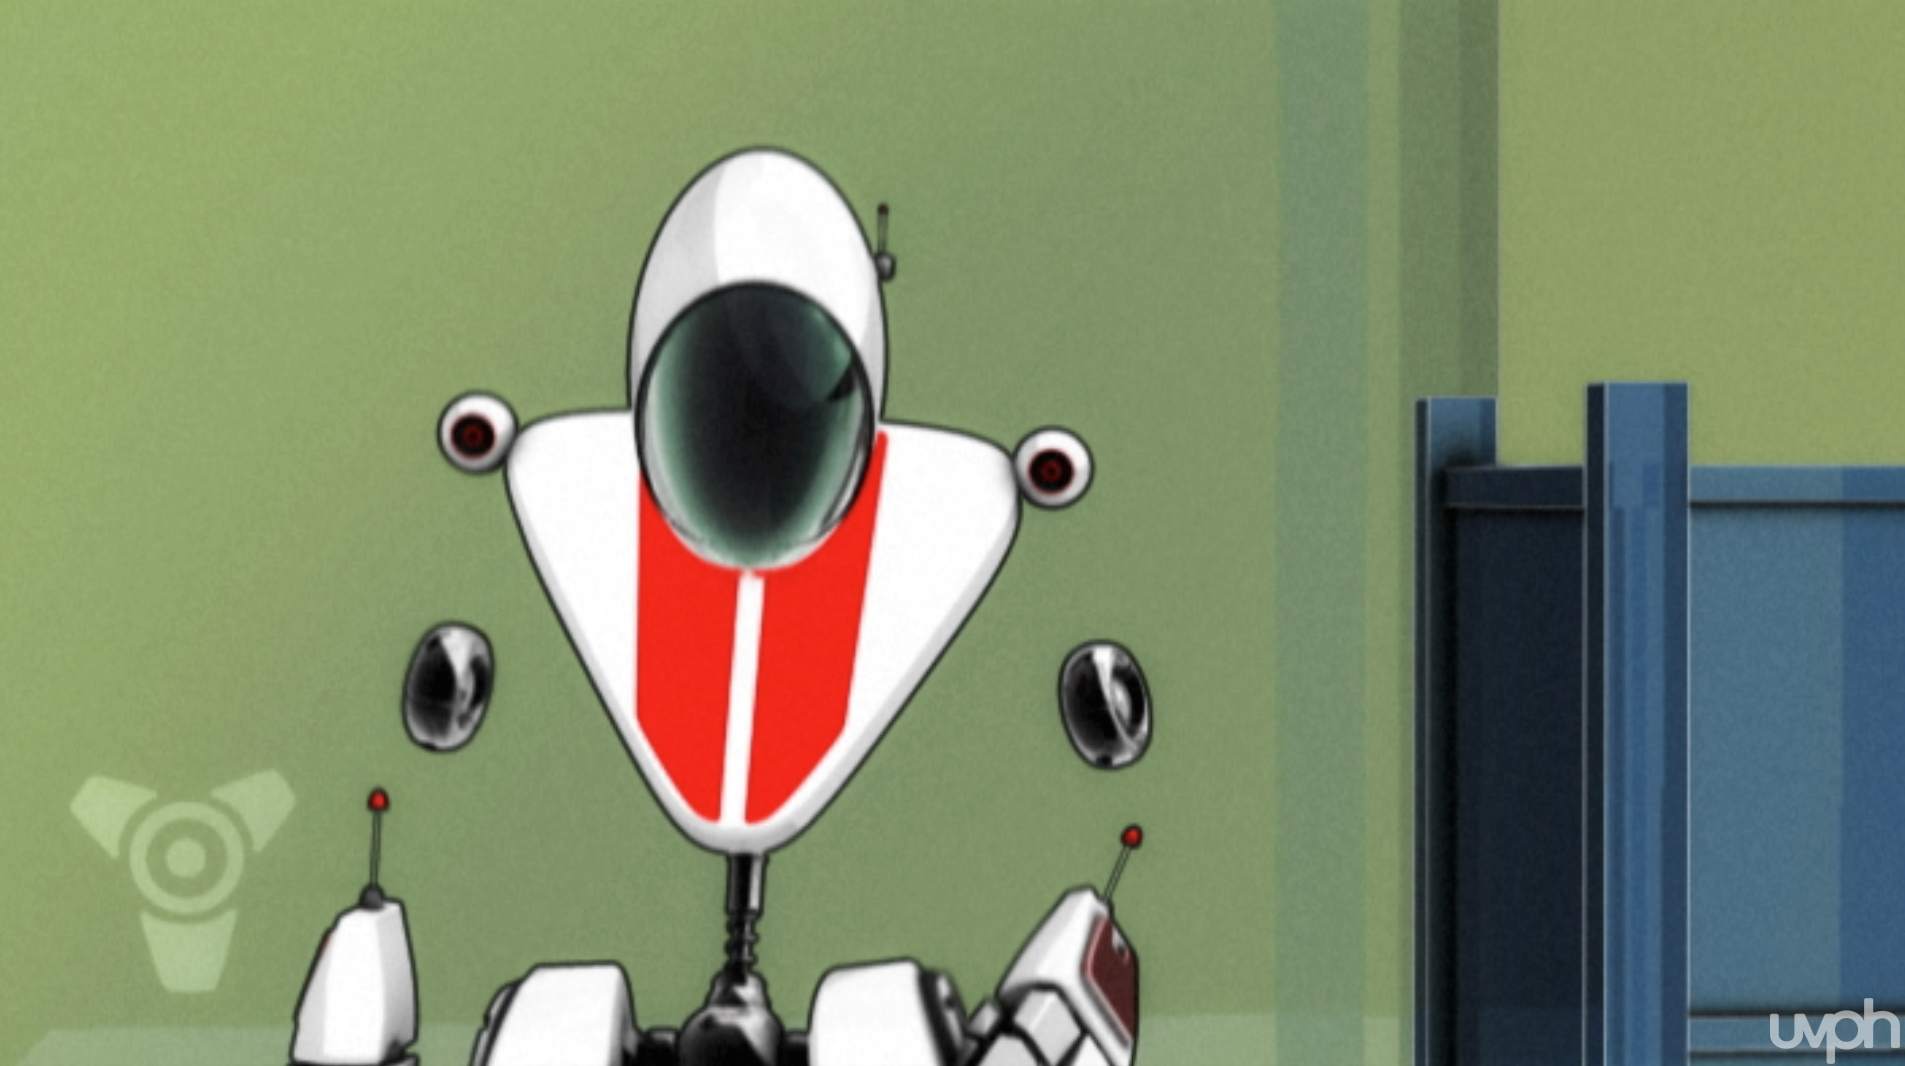 BEST ROBOT IDENTITY    Scent of a Robot  byPete Miser, Alexandre Moors